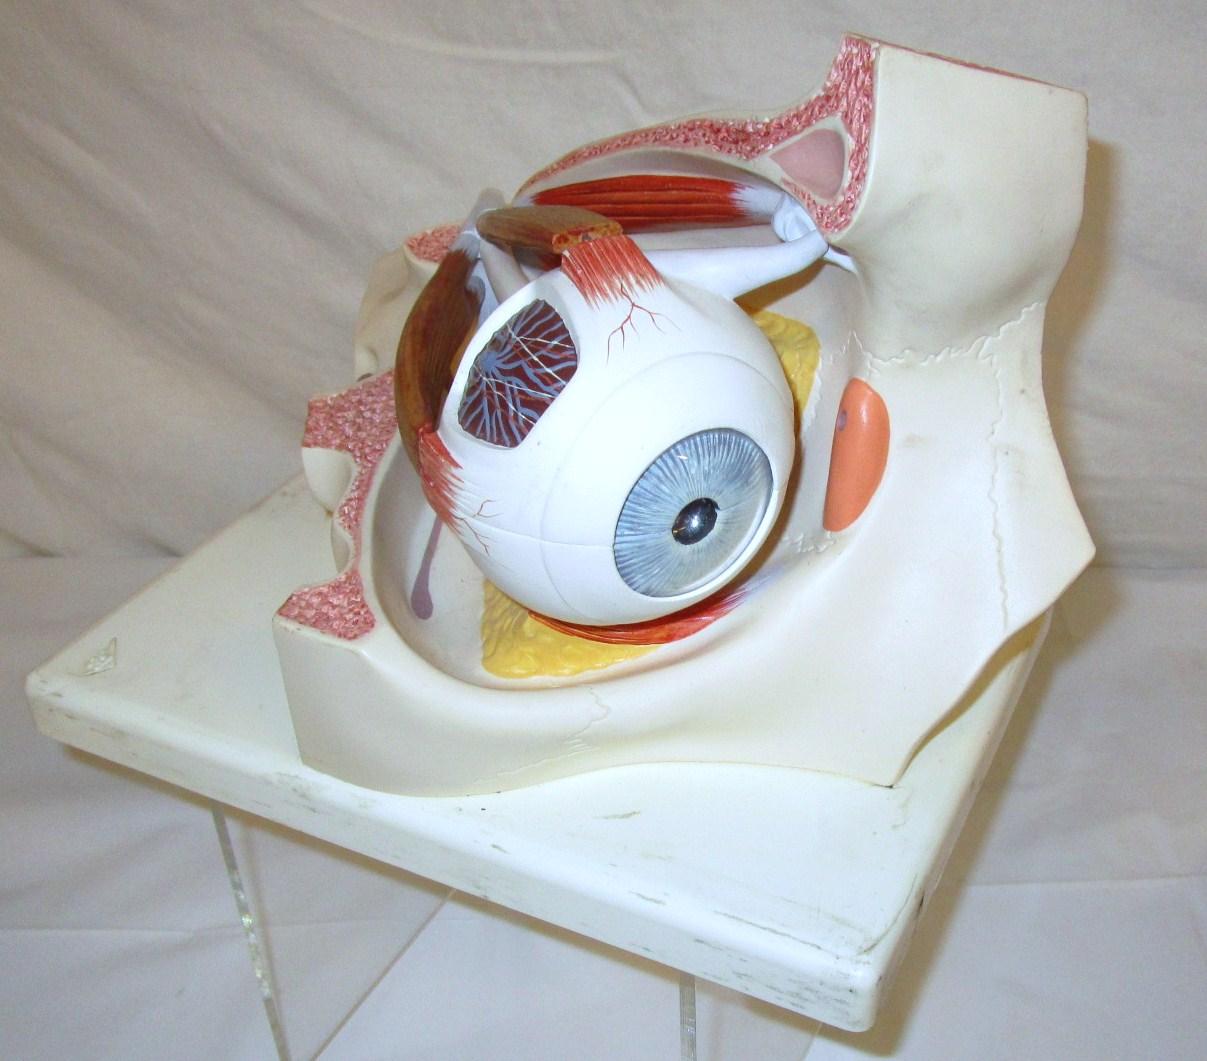 Model - human eye